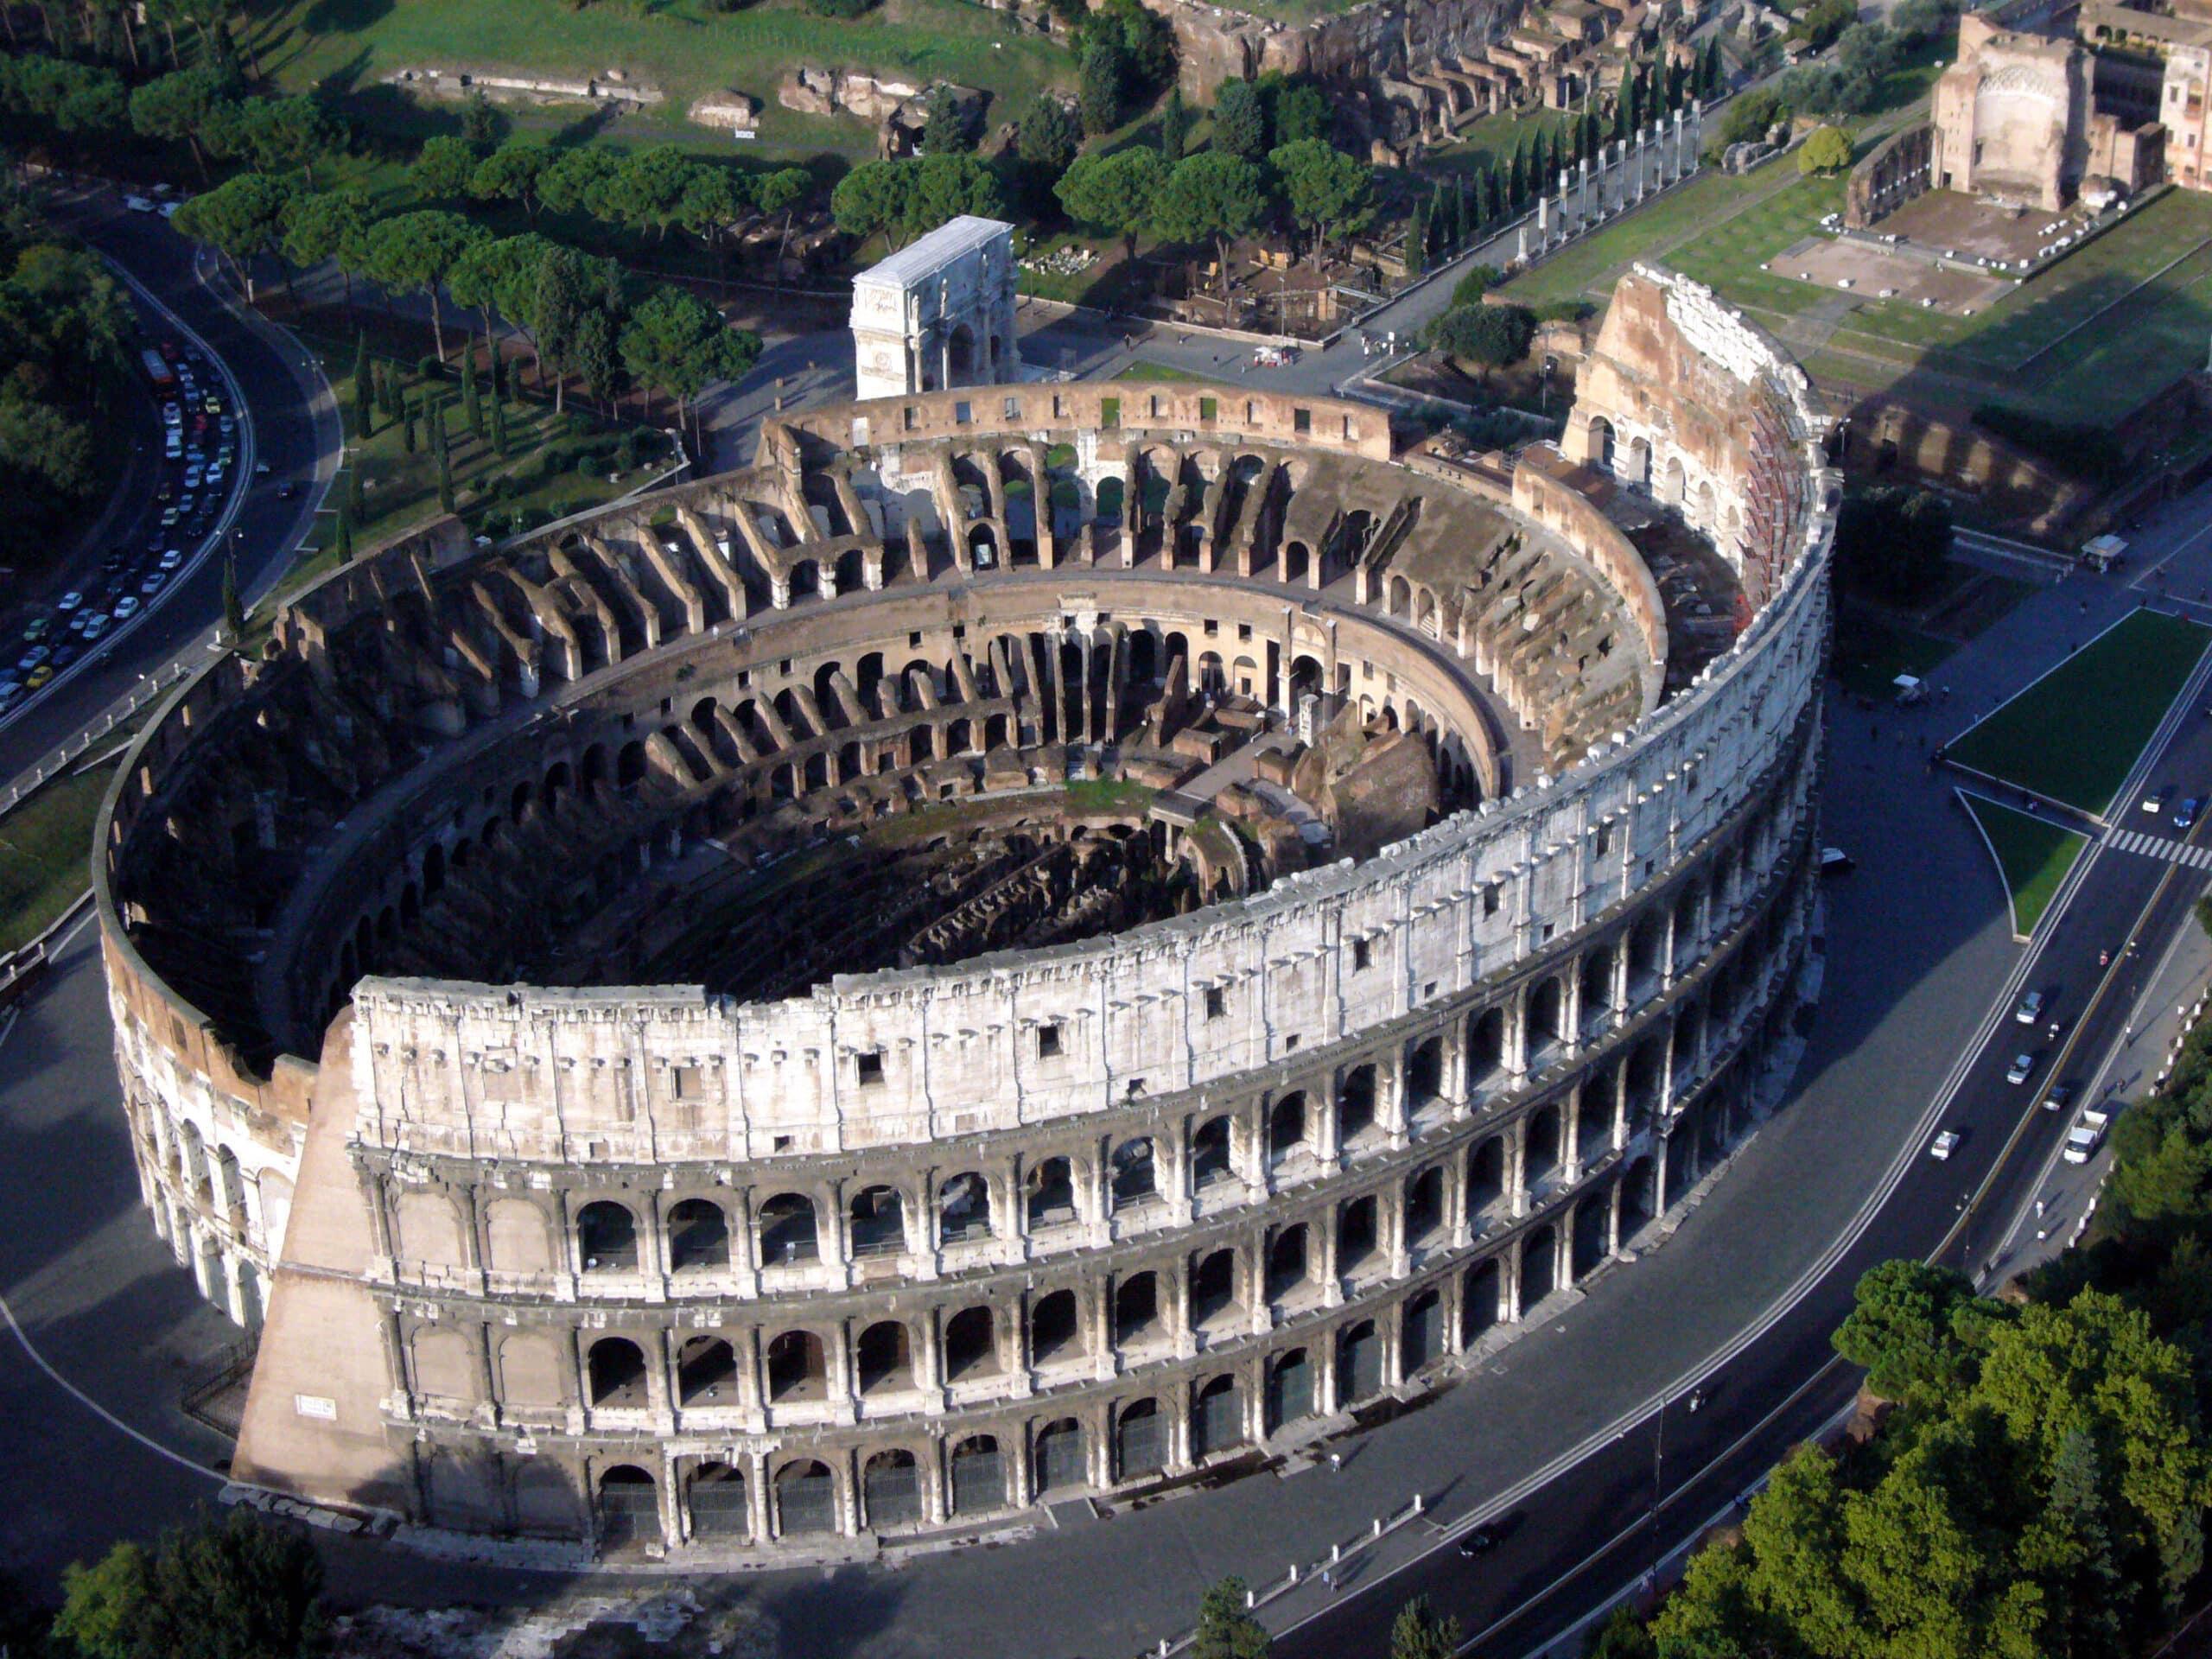 Colosseum - Aerial View